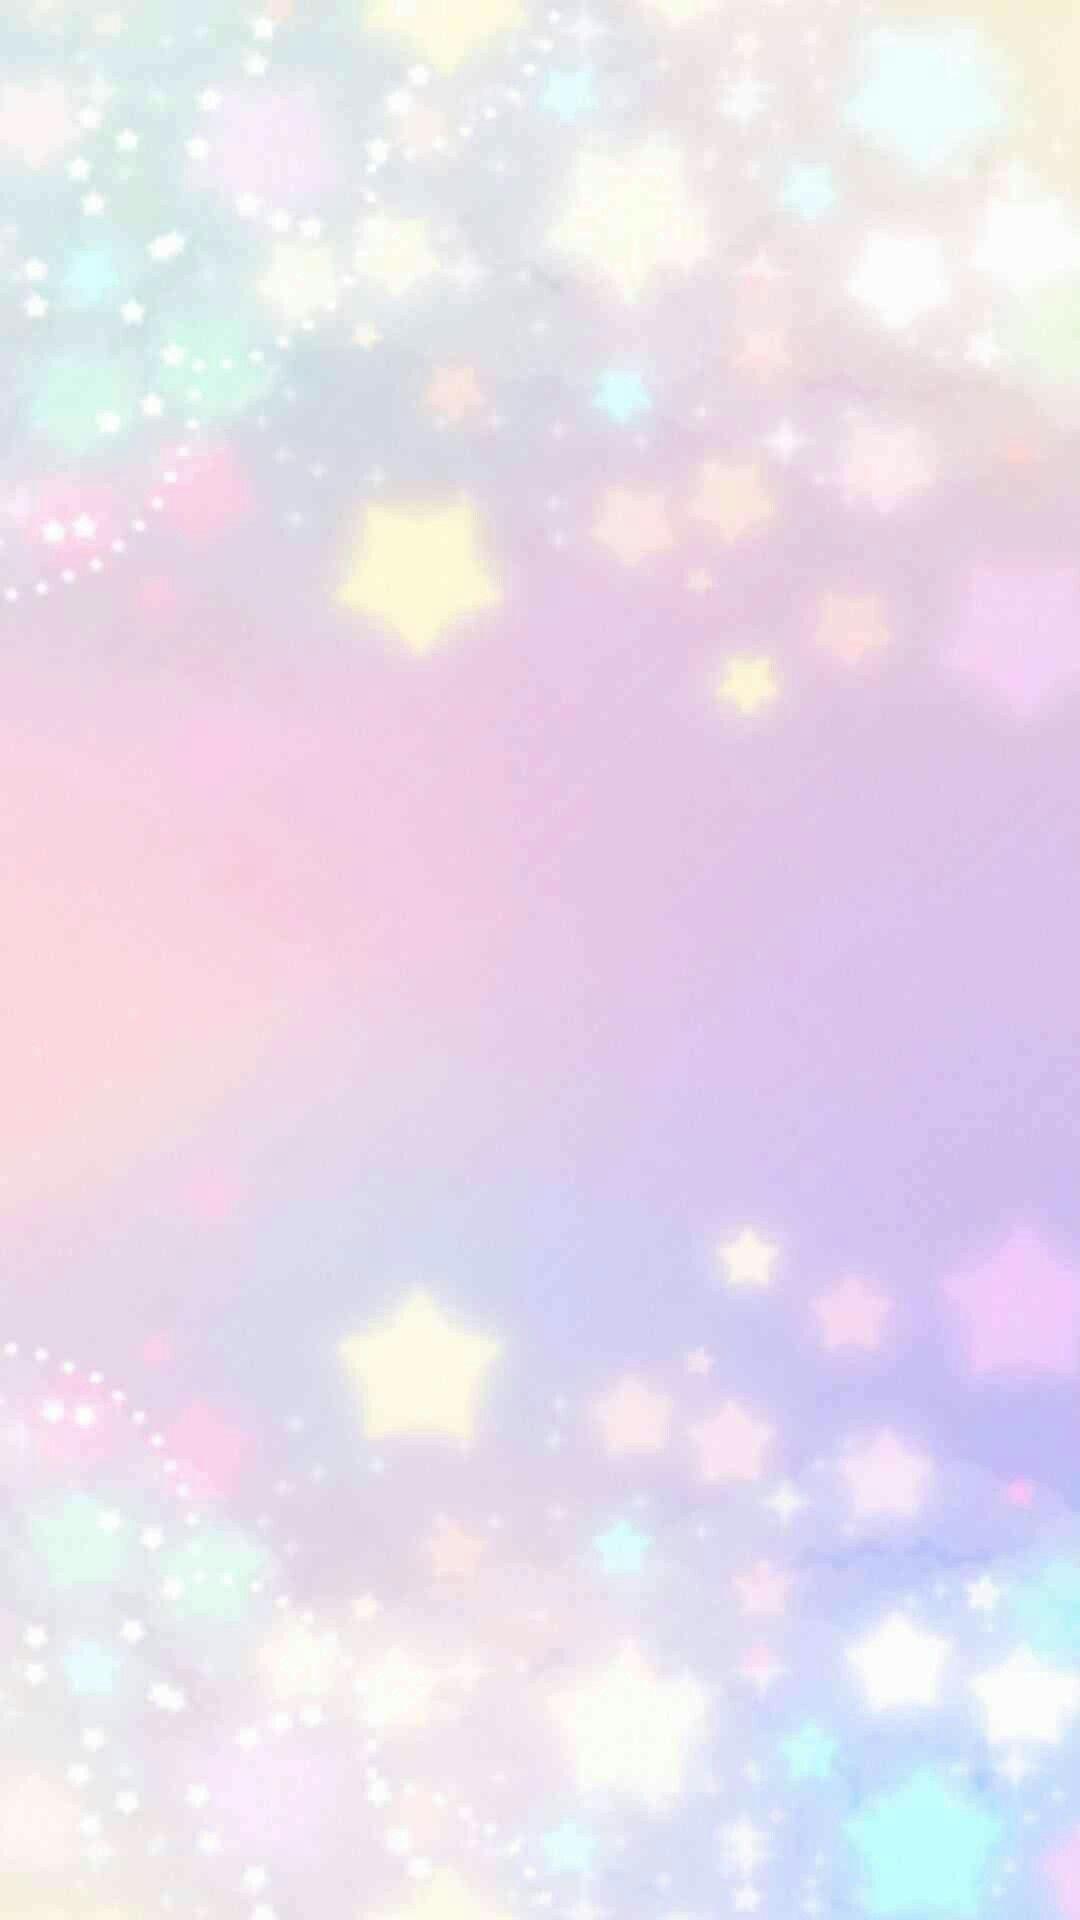 Sparkly Pastel ゆめかわいい 背景 キラキラ 壁紙 ゆめかわいい